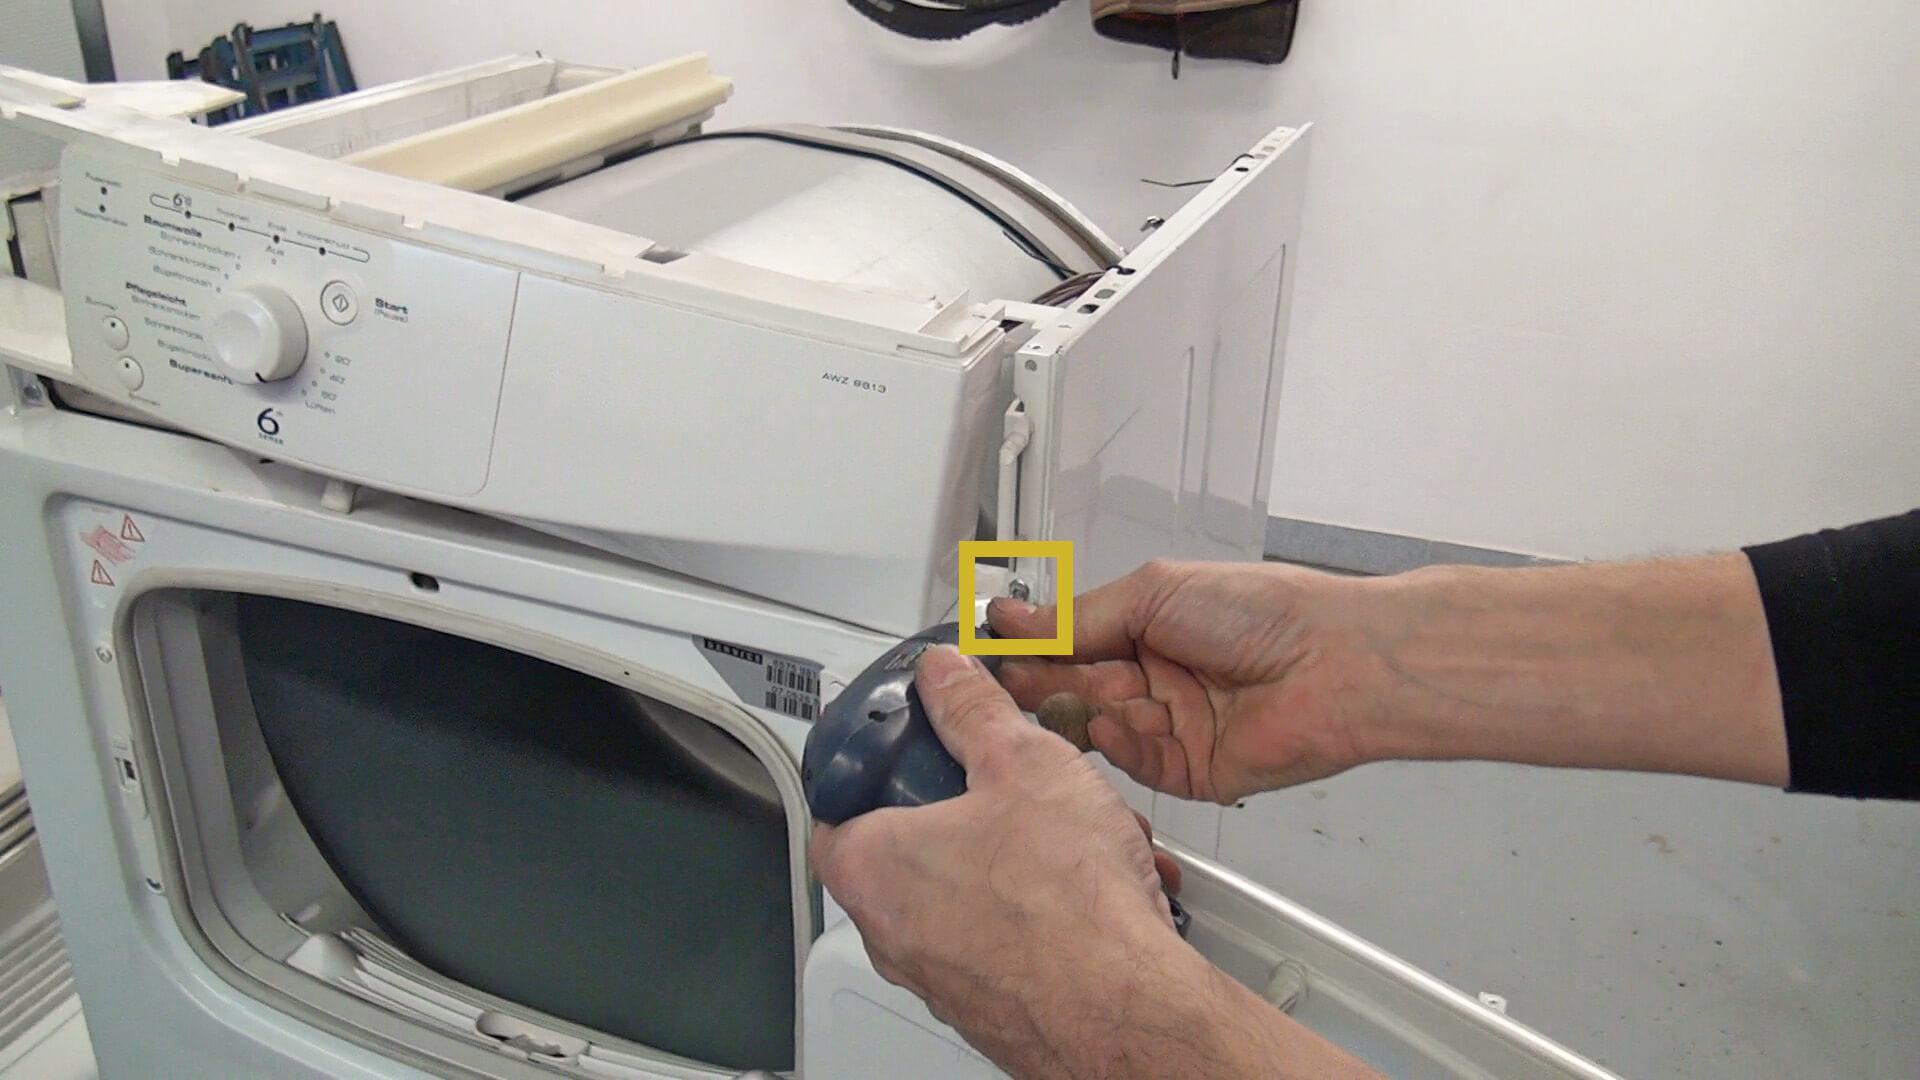 Siemens Kühlschrank Quietscht : Kühlschrank quietscht kühlschrank quietscht beim kühlen deptis